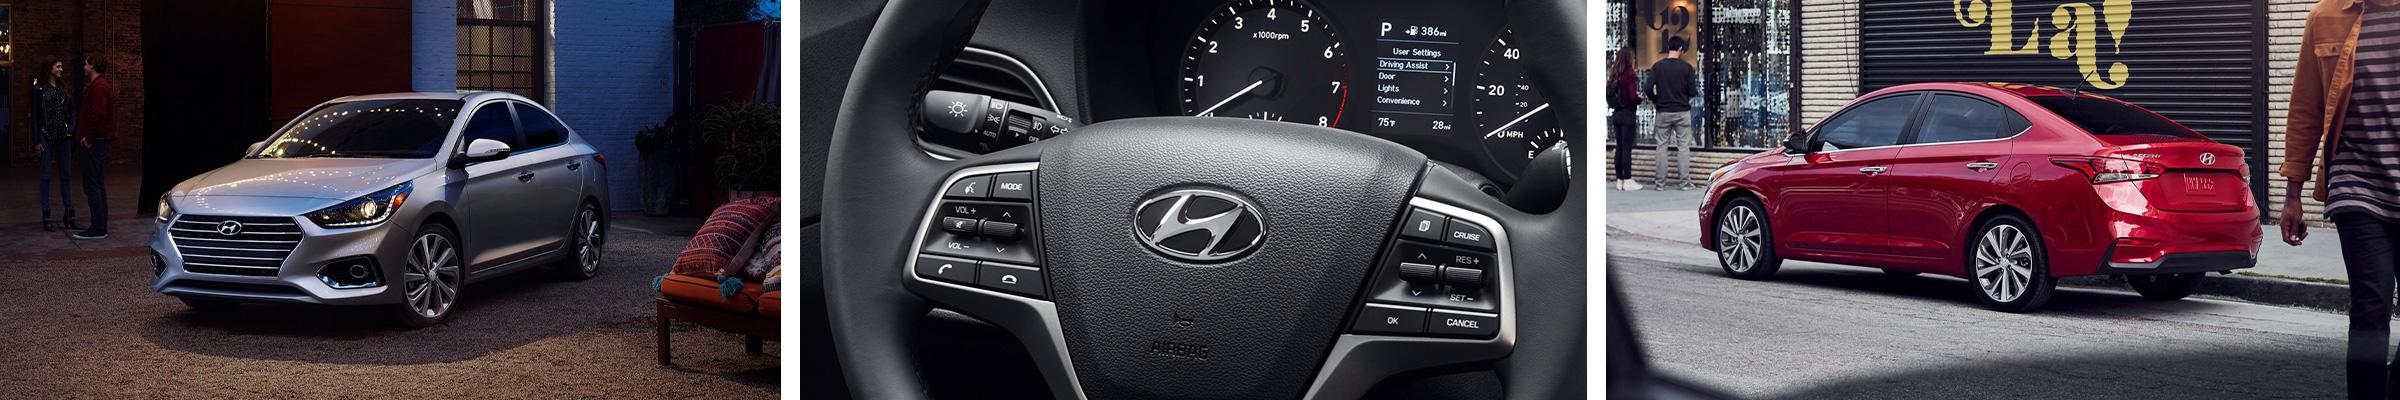 2021 Hyundai Accent For Sale Dearborn MI | Detroit